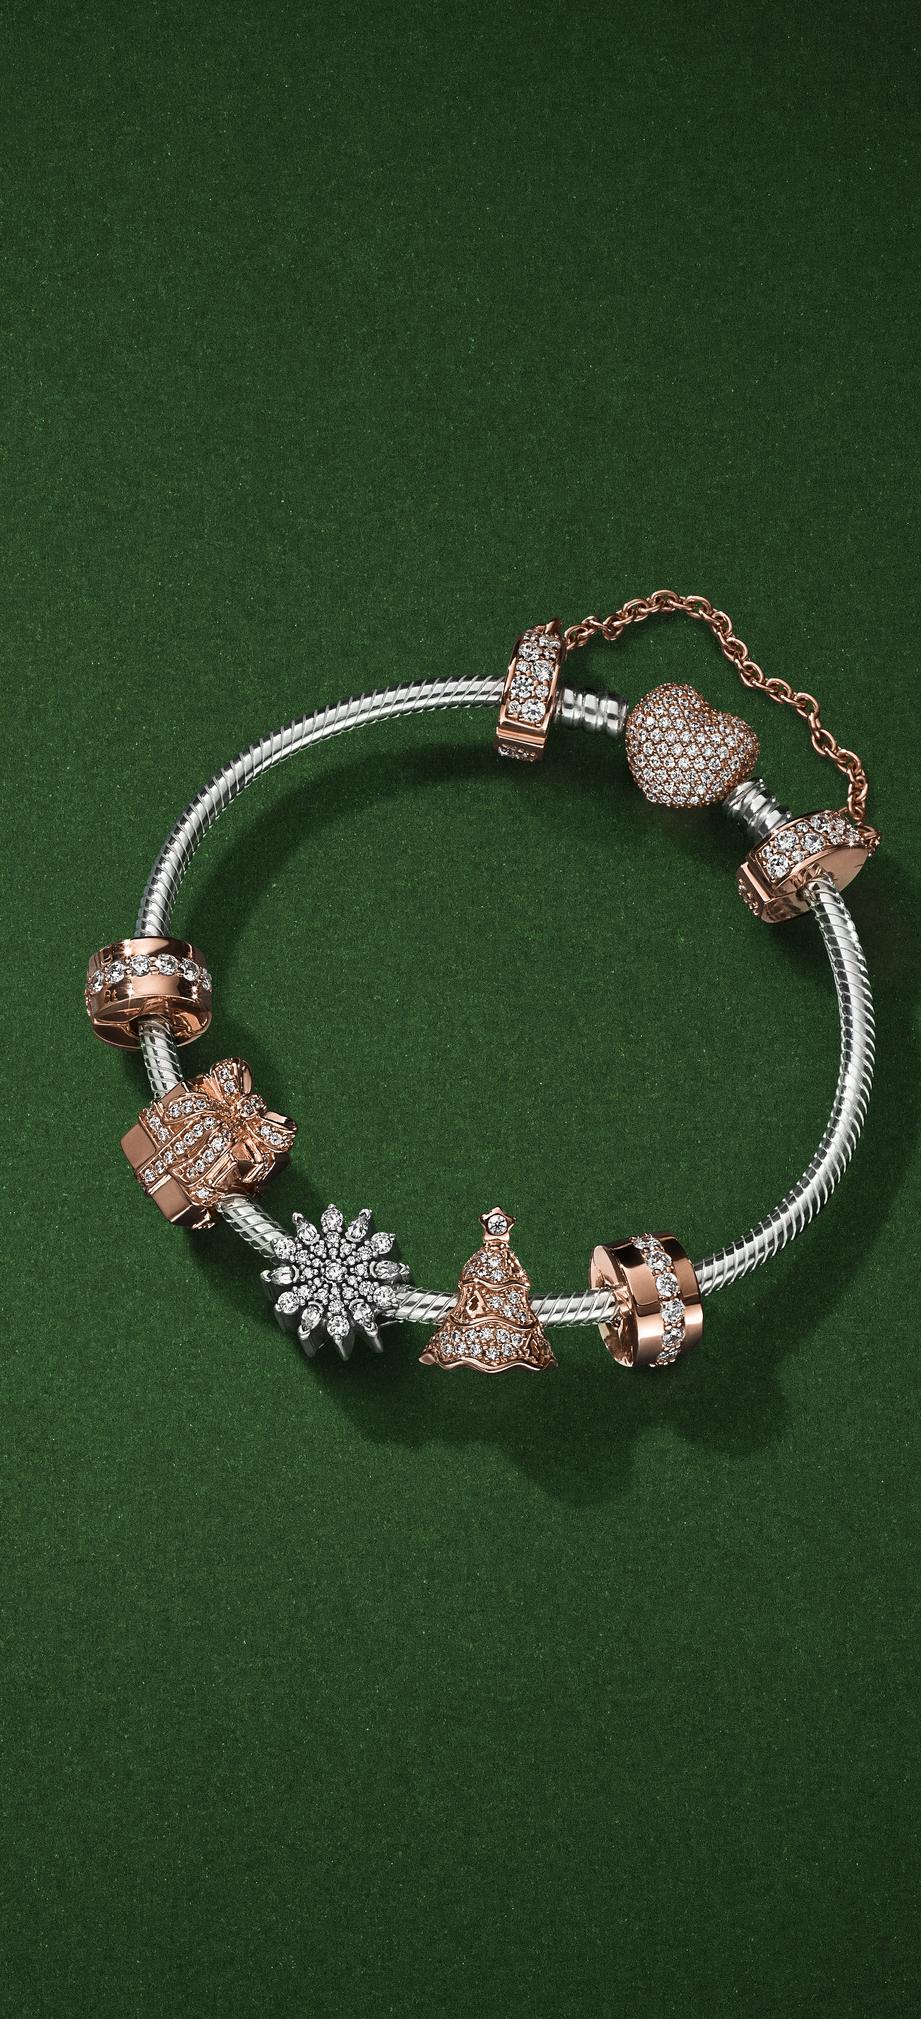 How Much Are Pandora Bracelets Worth : pandora, bracelets, worth, Adorn, Wrist, Sparkling, Christmas, Charms, PANDORA, Rose,, Unique, Blush, Metal, Pandora, Bracelet, Designs,, Style, Charms,, Jewelry